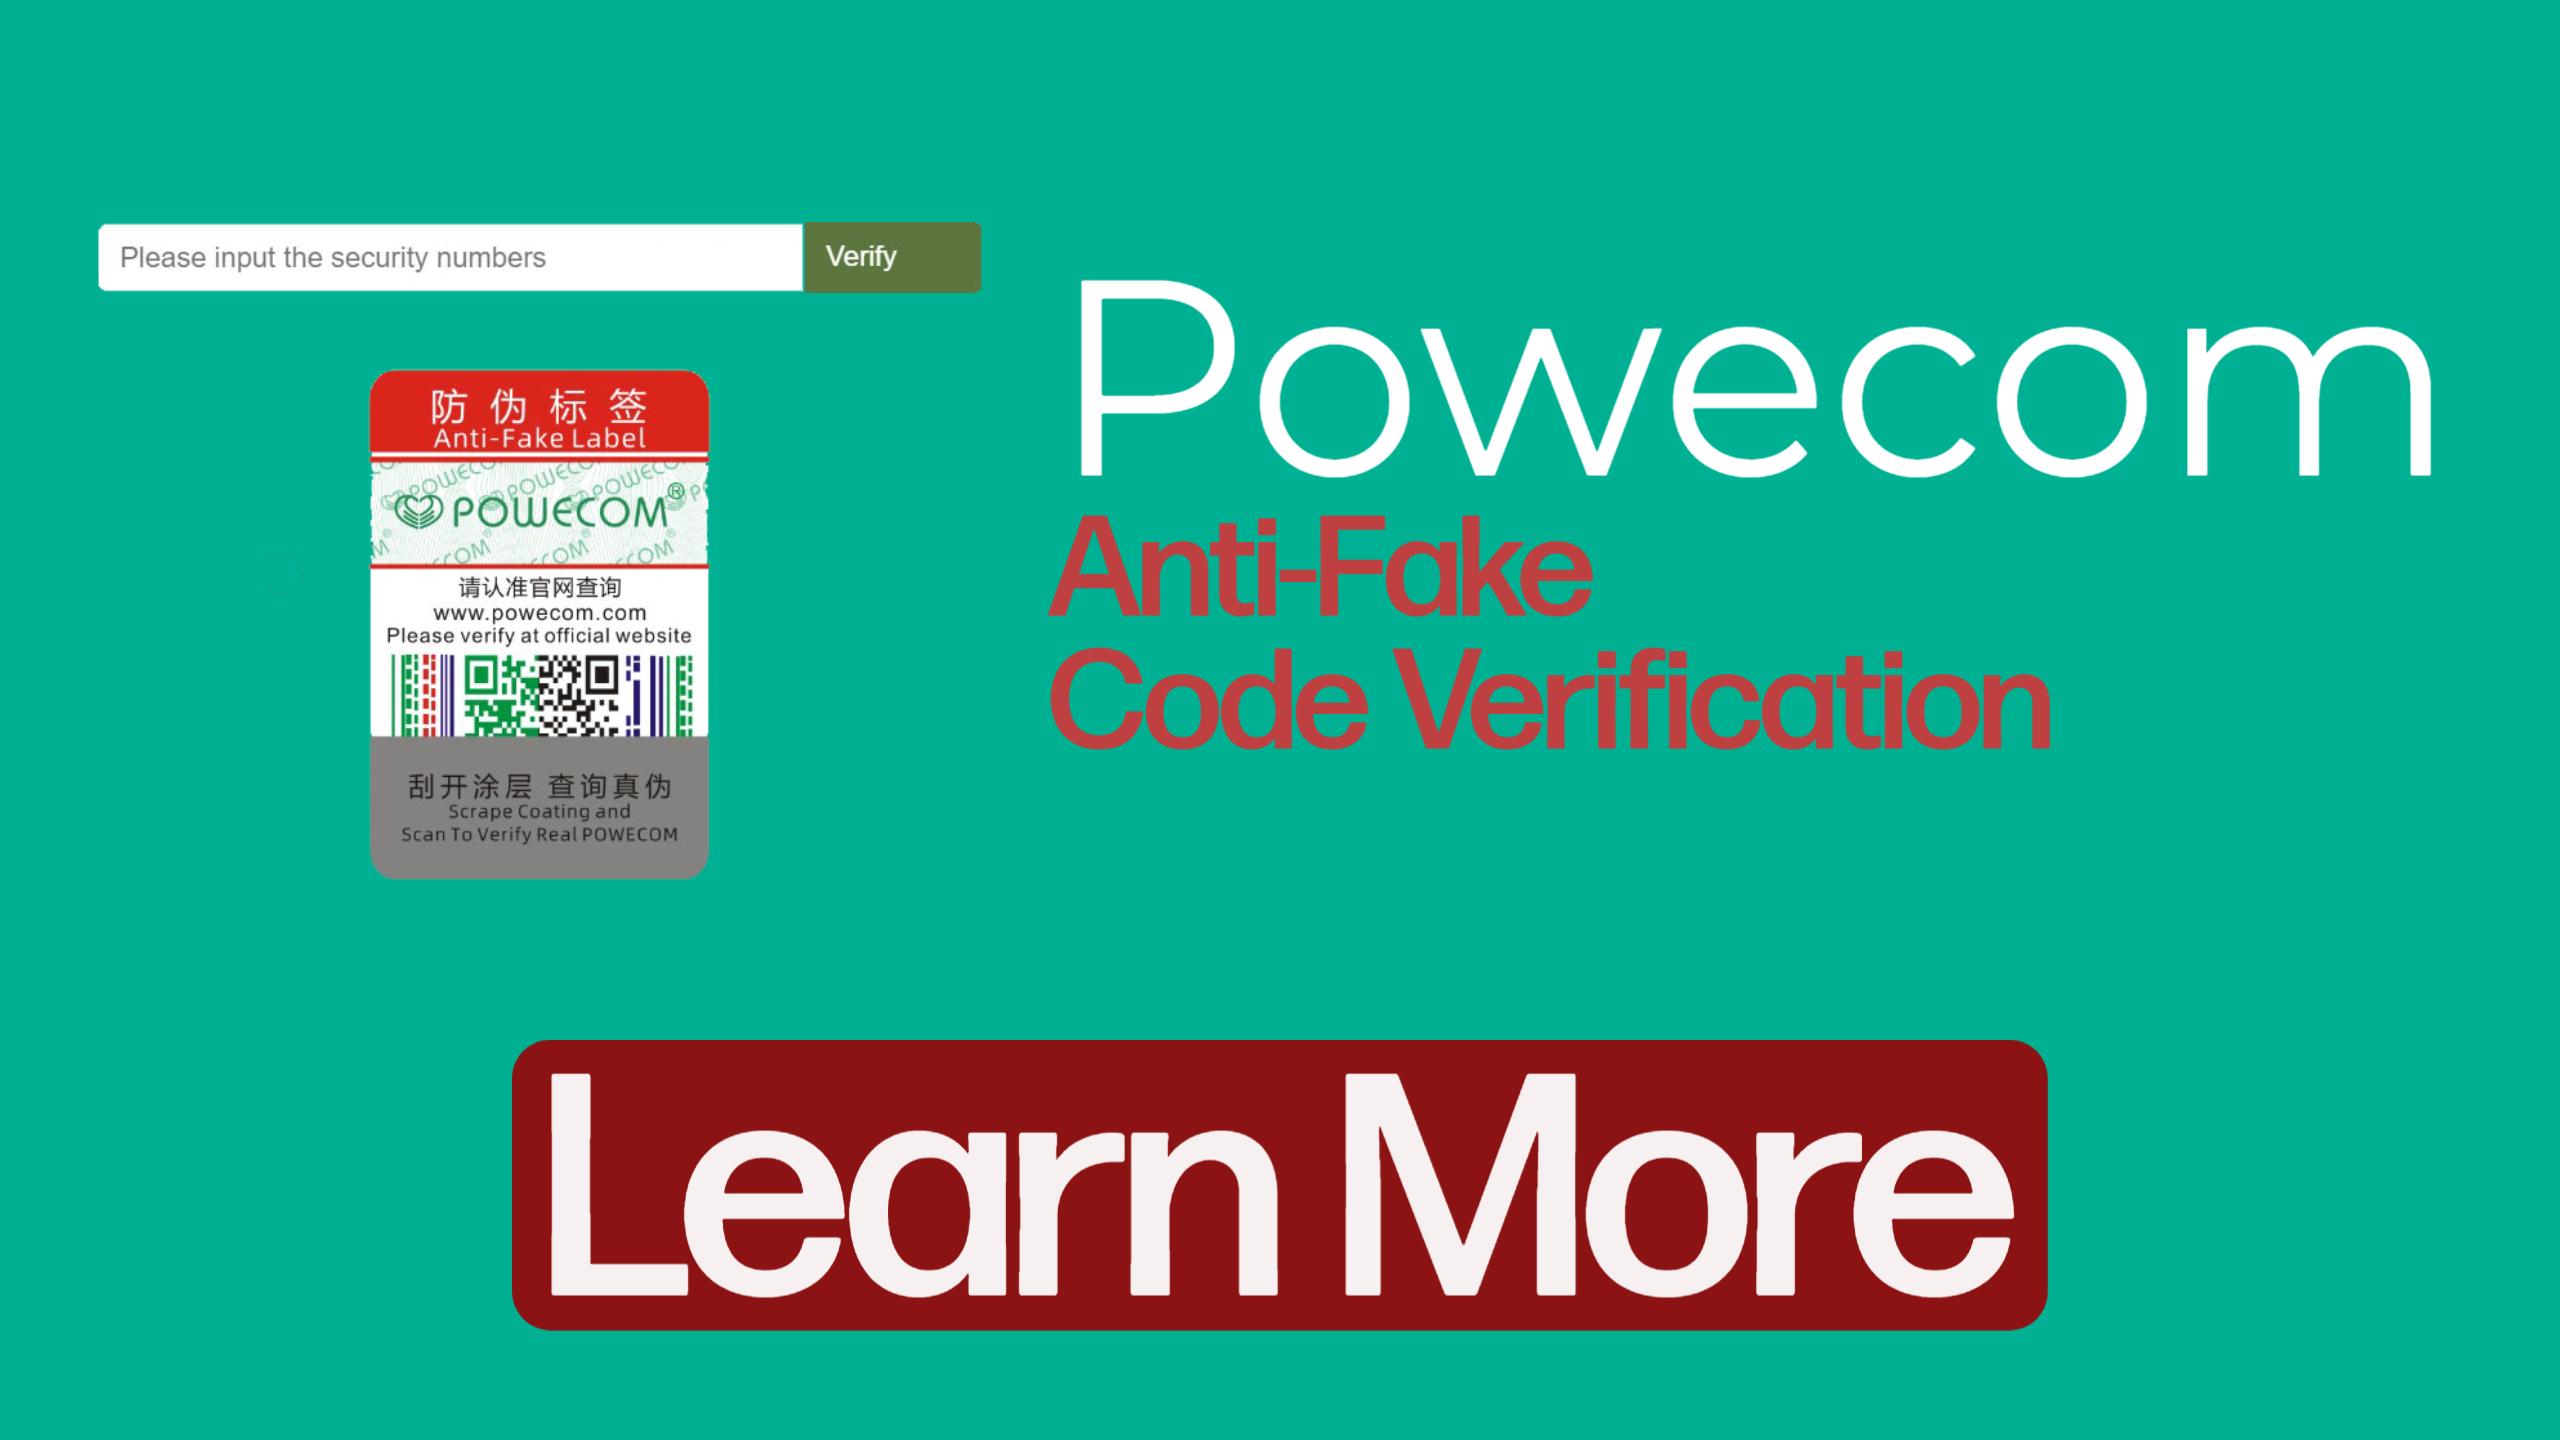 Powecom KN95 Anti Fake Sticker Verification